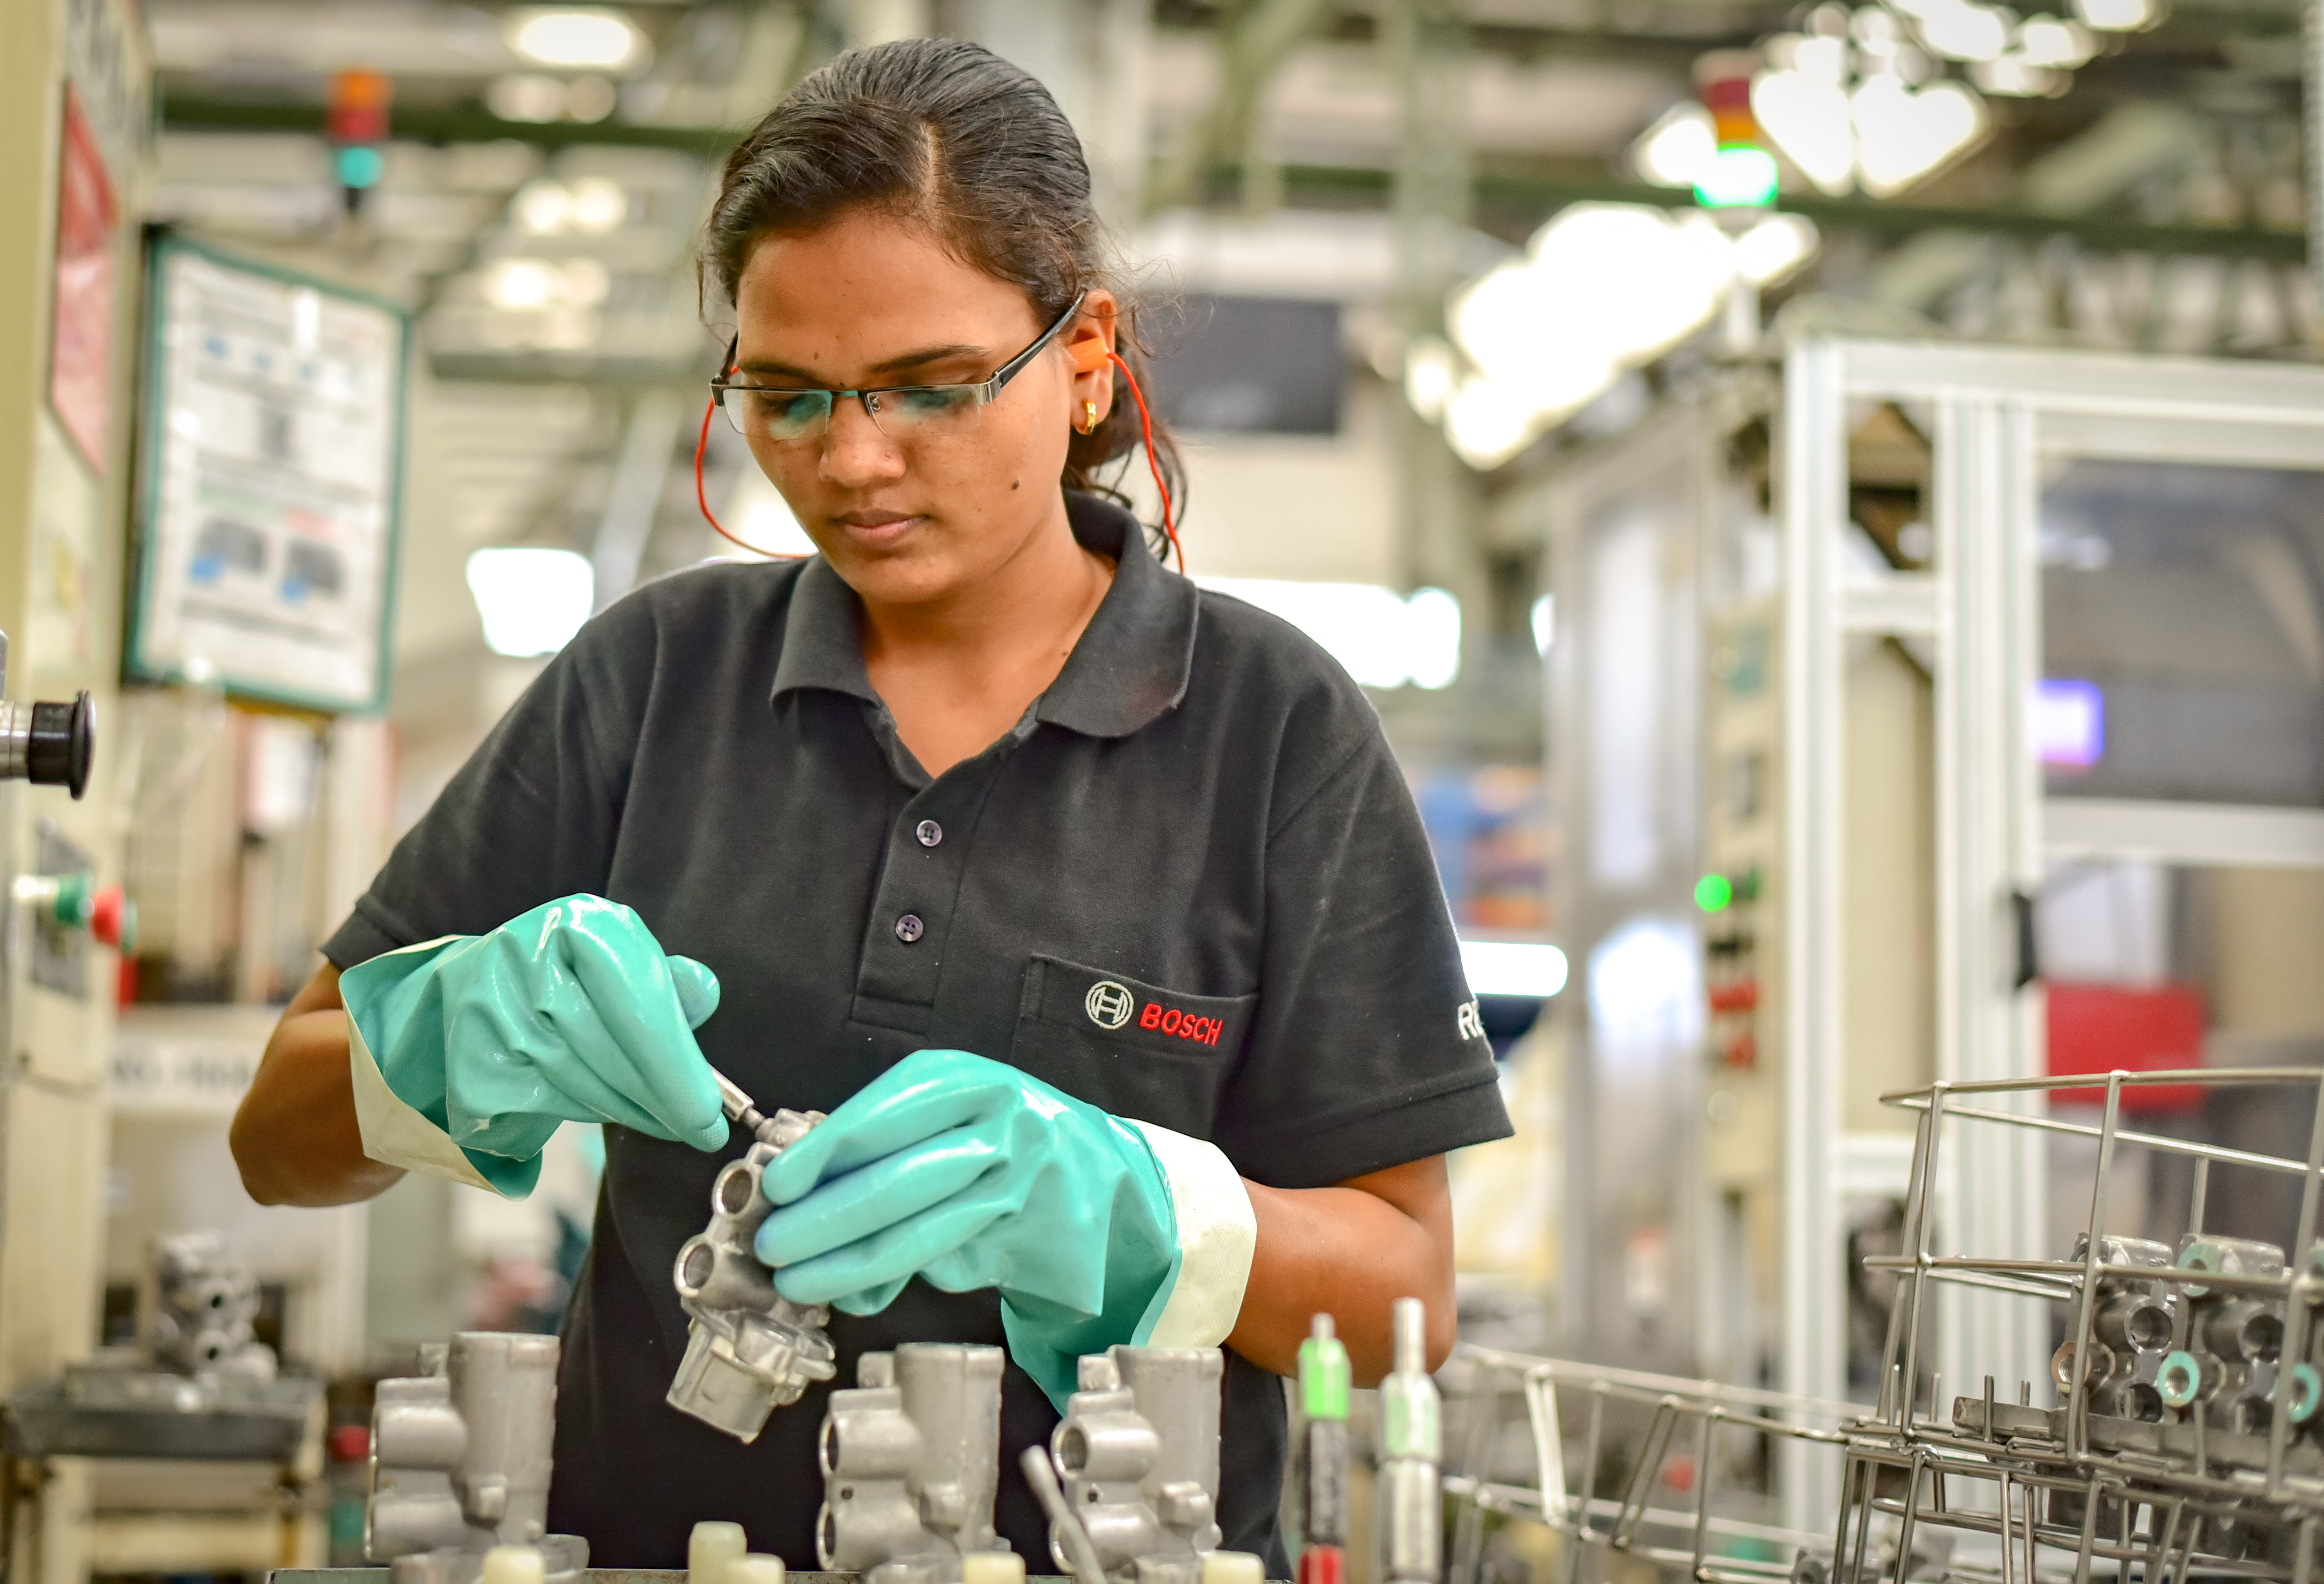 Bosch in India